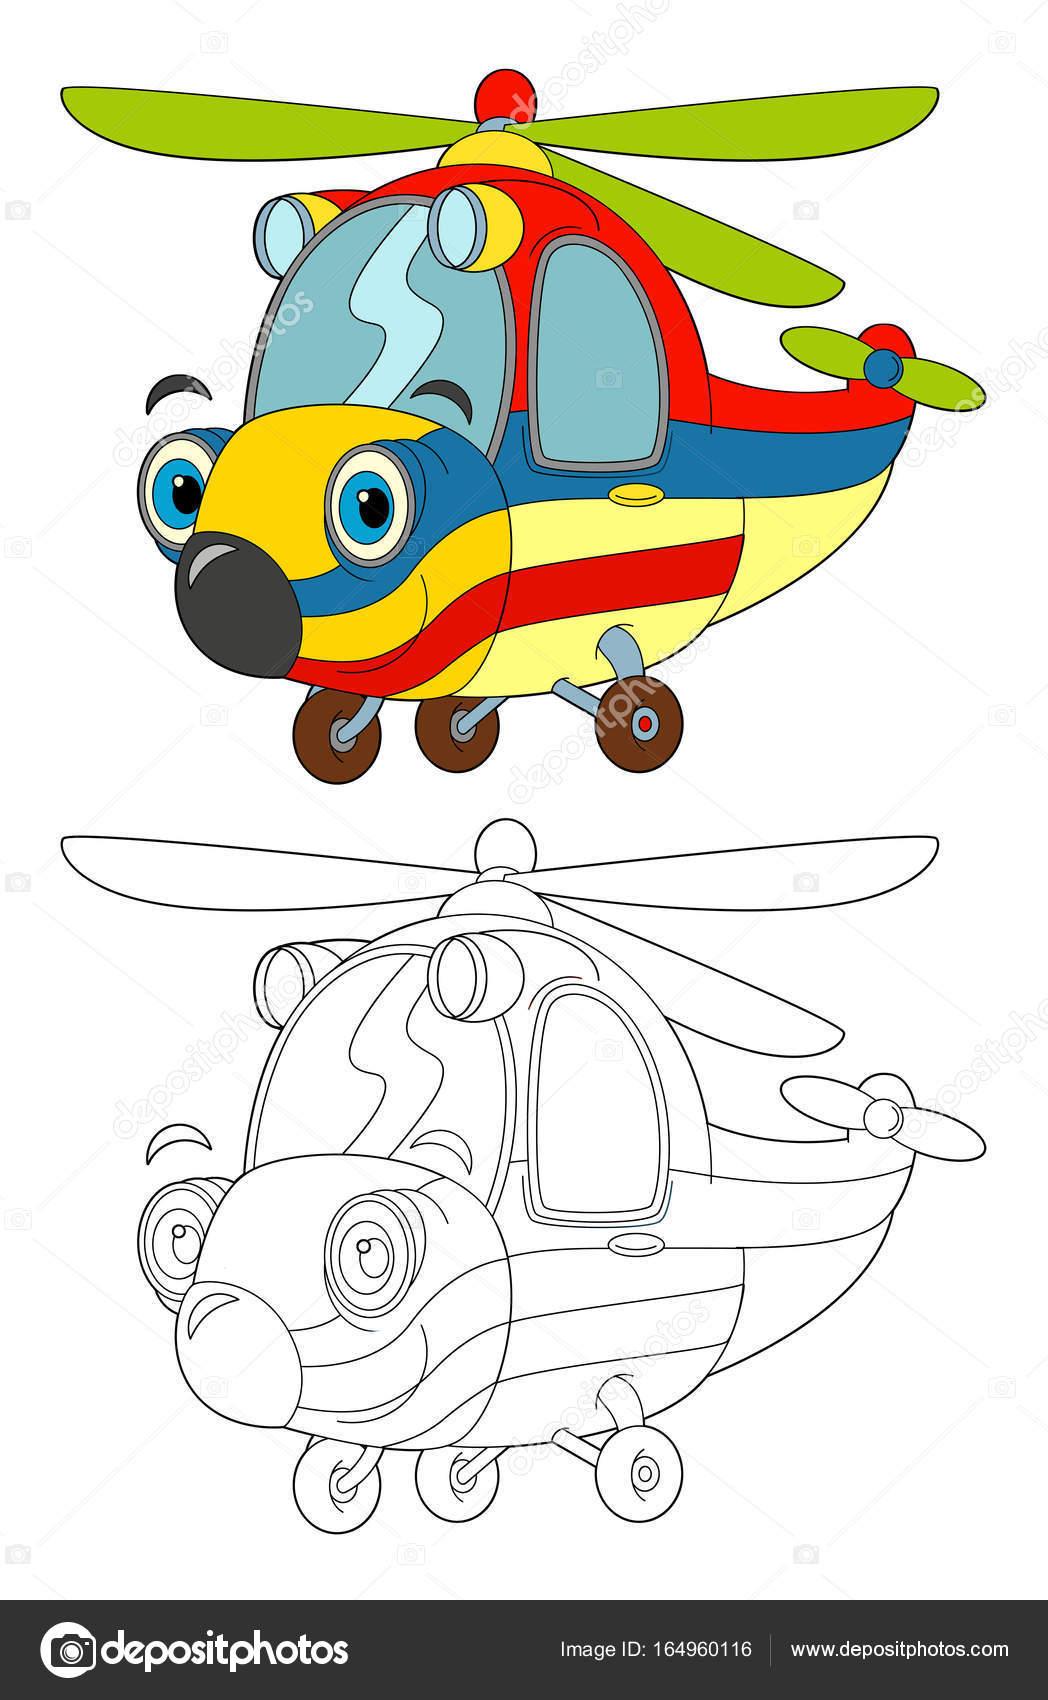 Kleurplaat Ambulance Helicopter Archidev